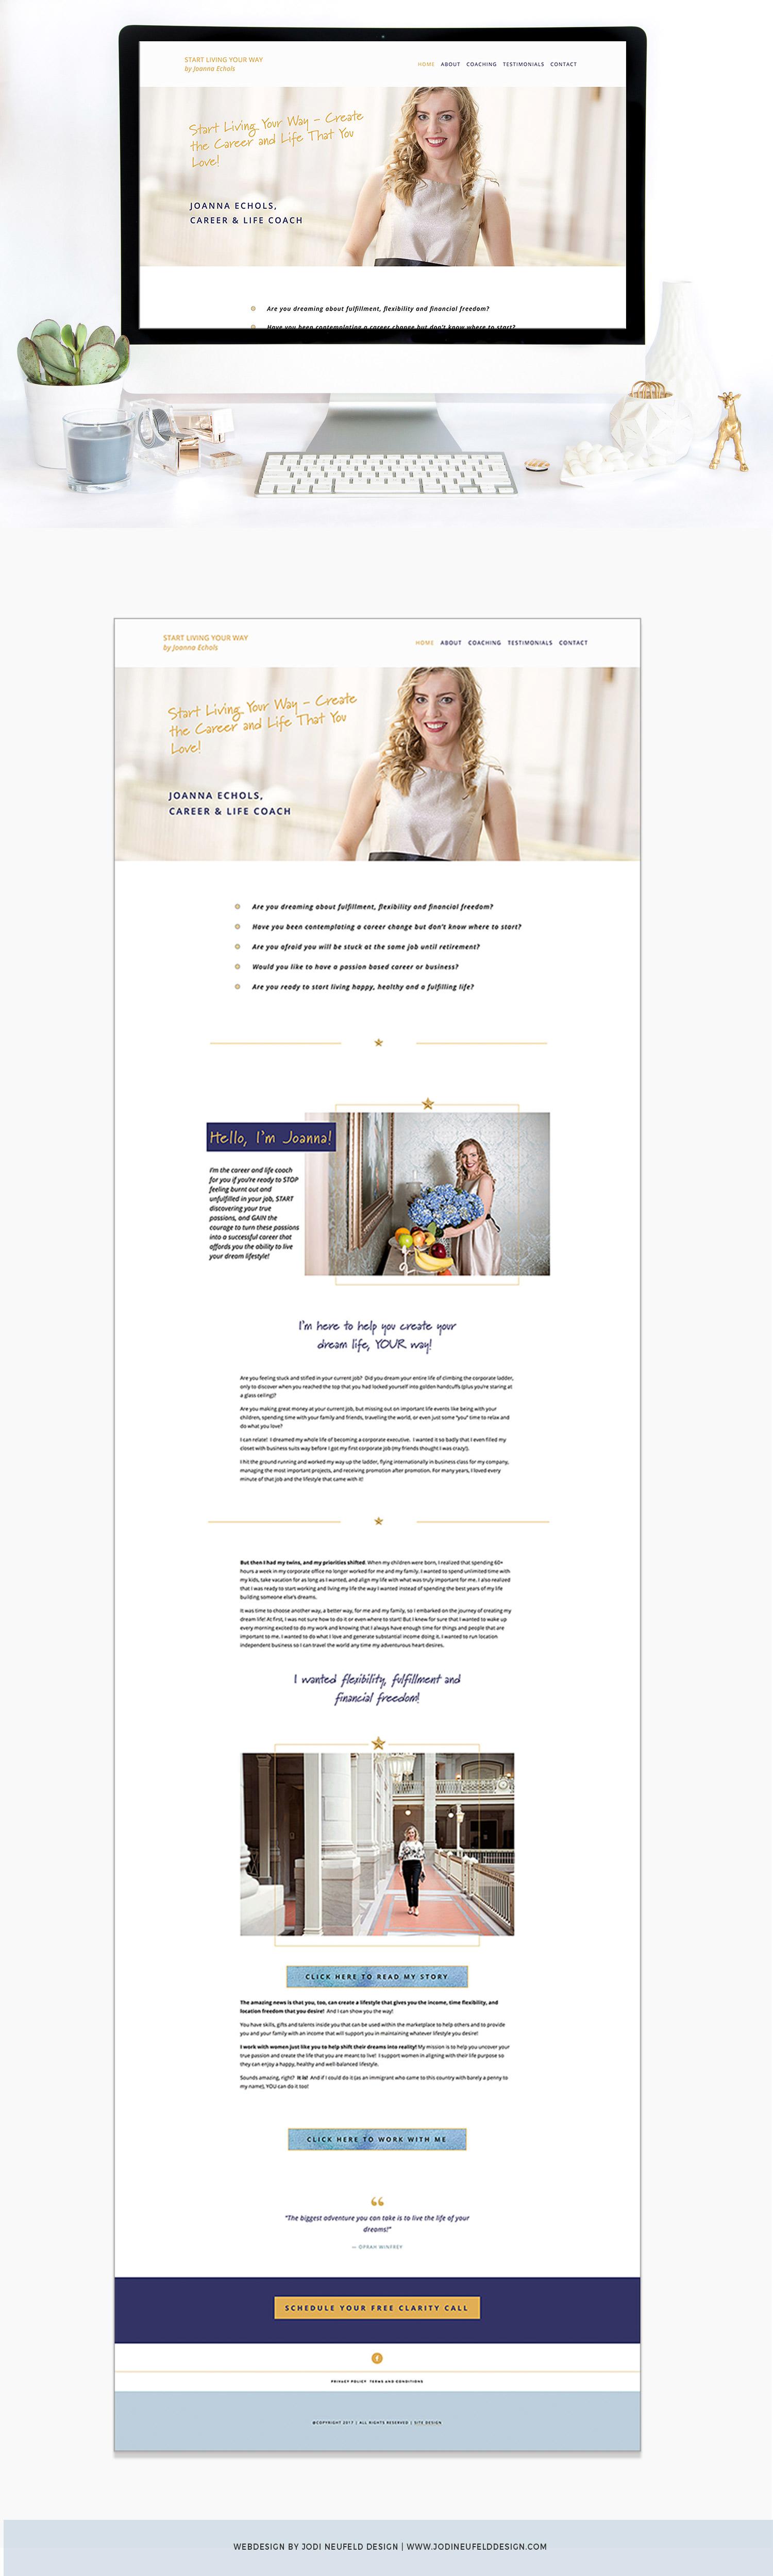 Joanna Echols Squarespace Web design | Jodi Neufeld Design